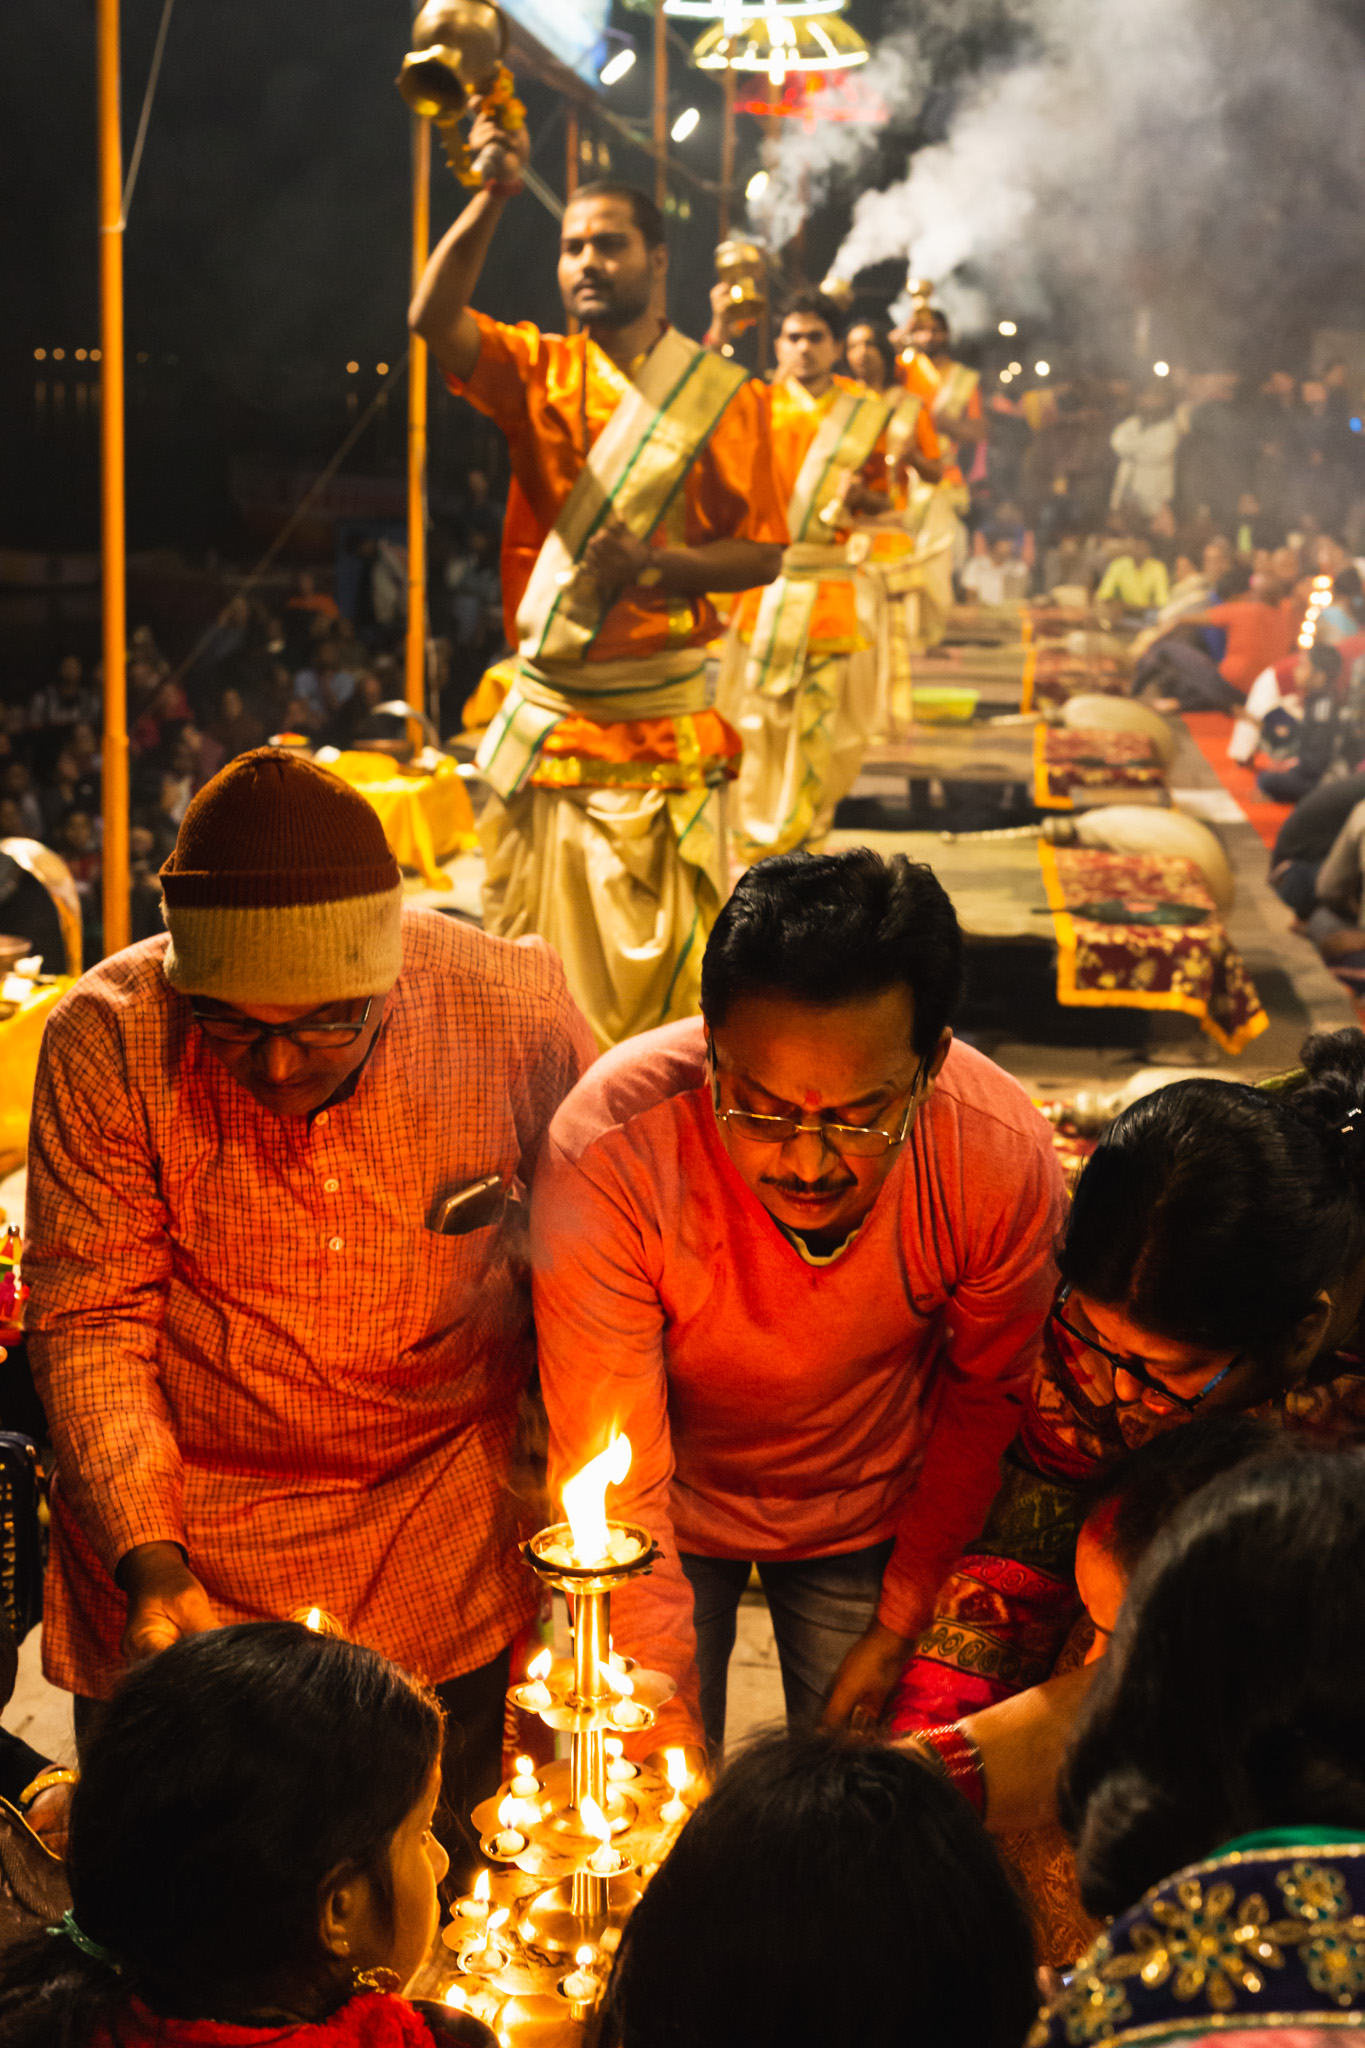 Preparing candles for Ceremony in Varanasi, India.